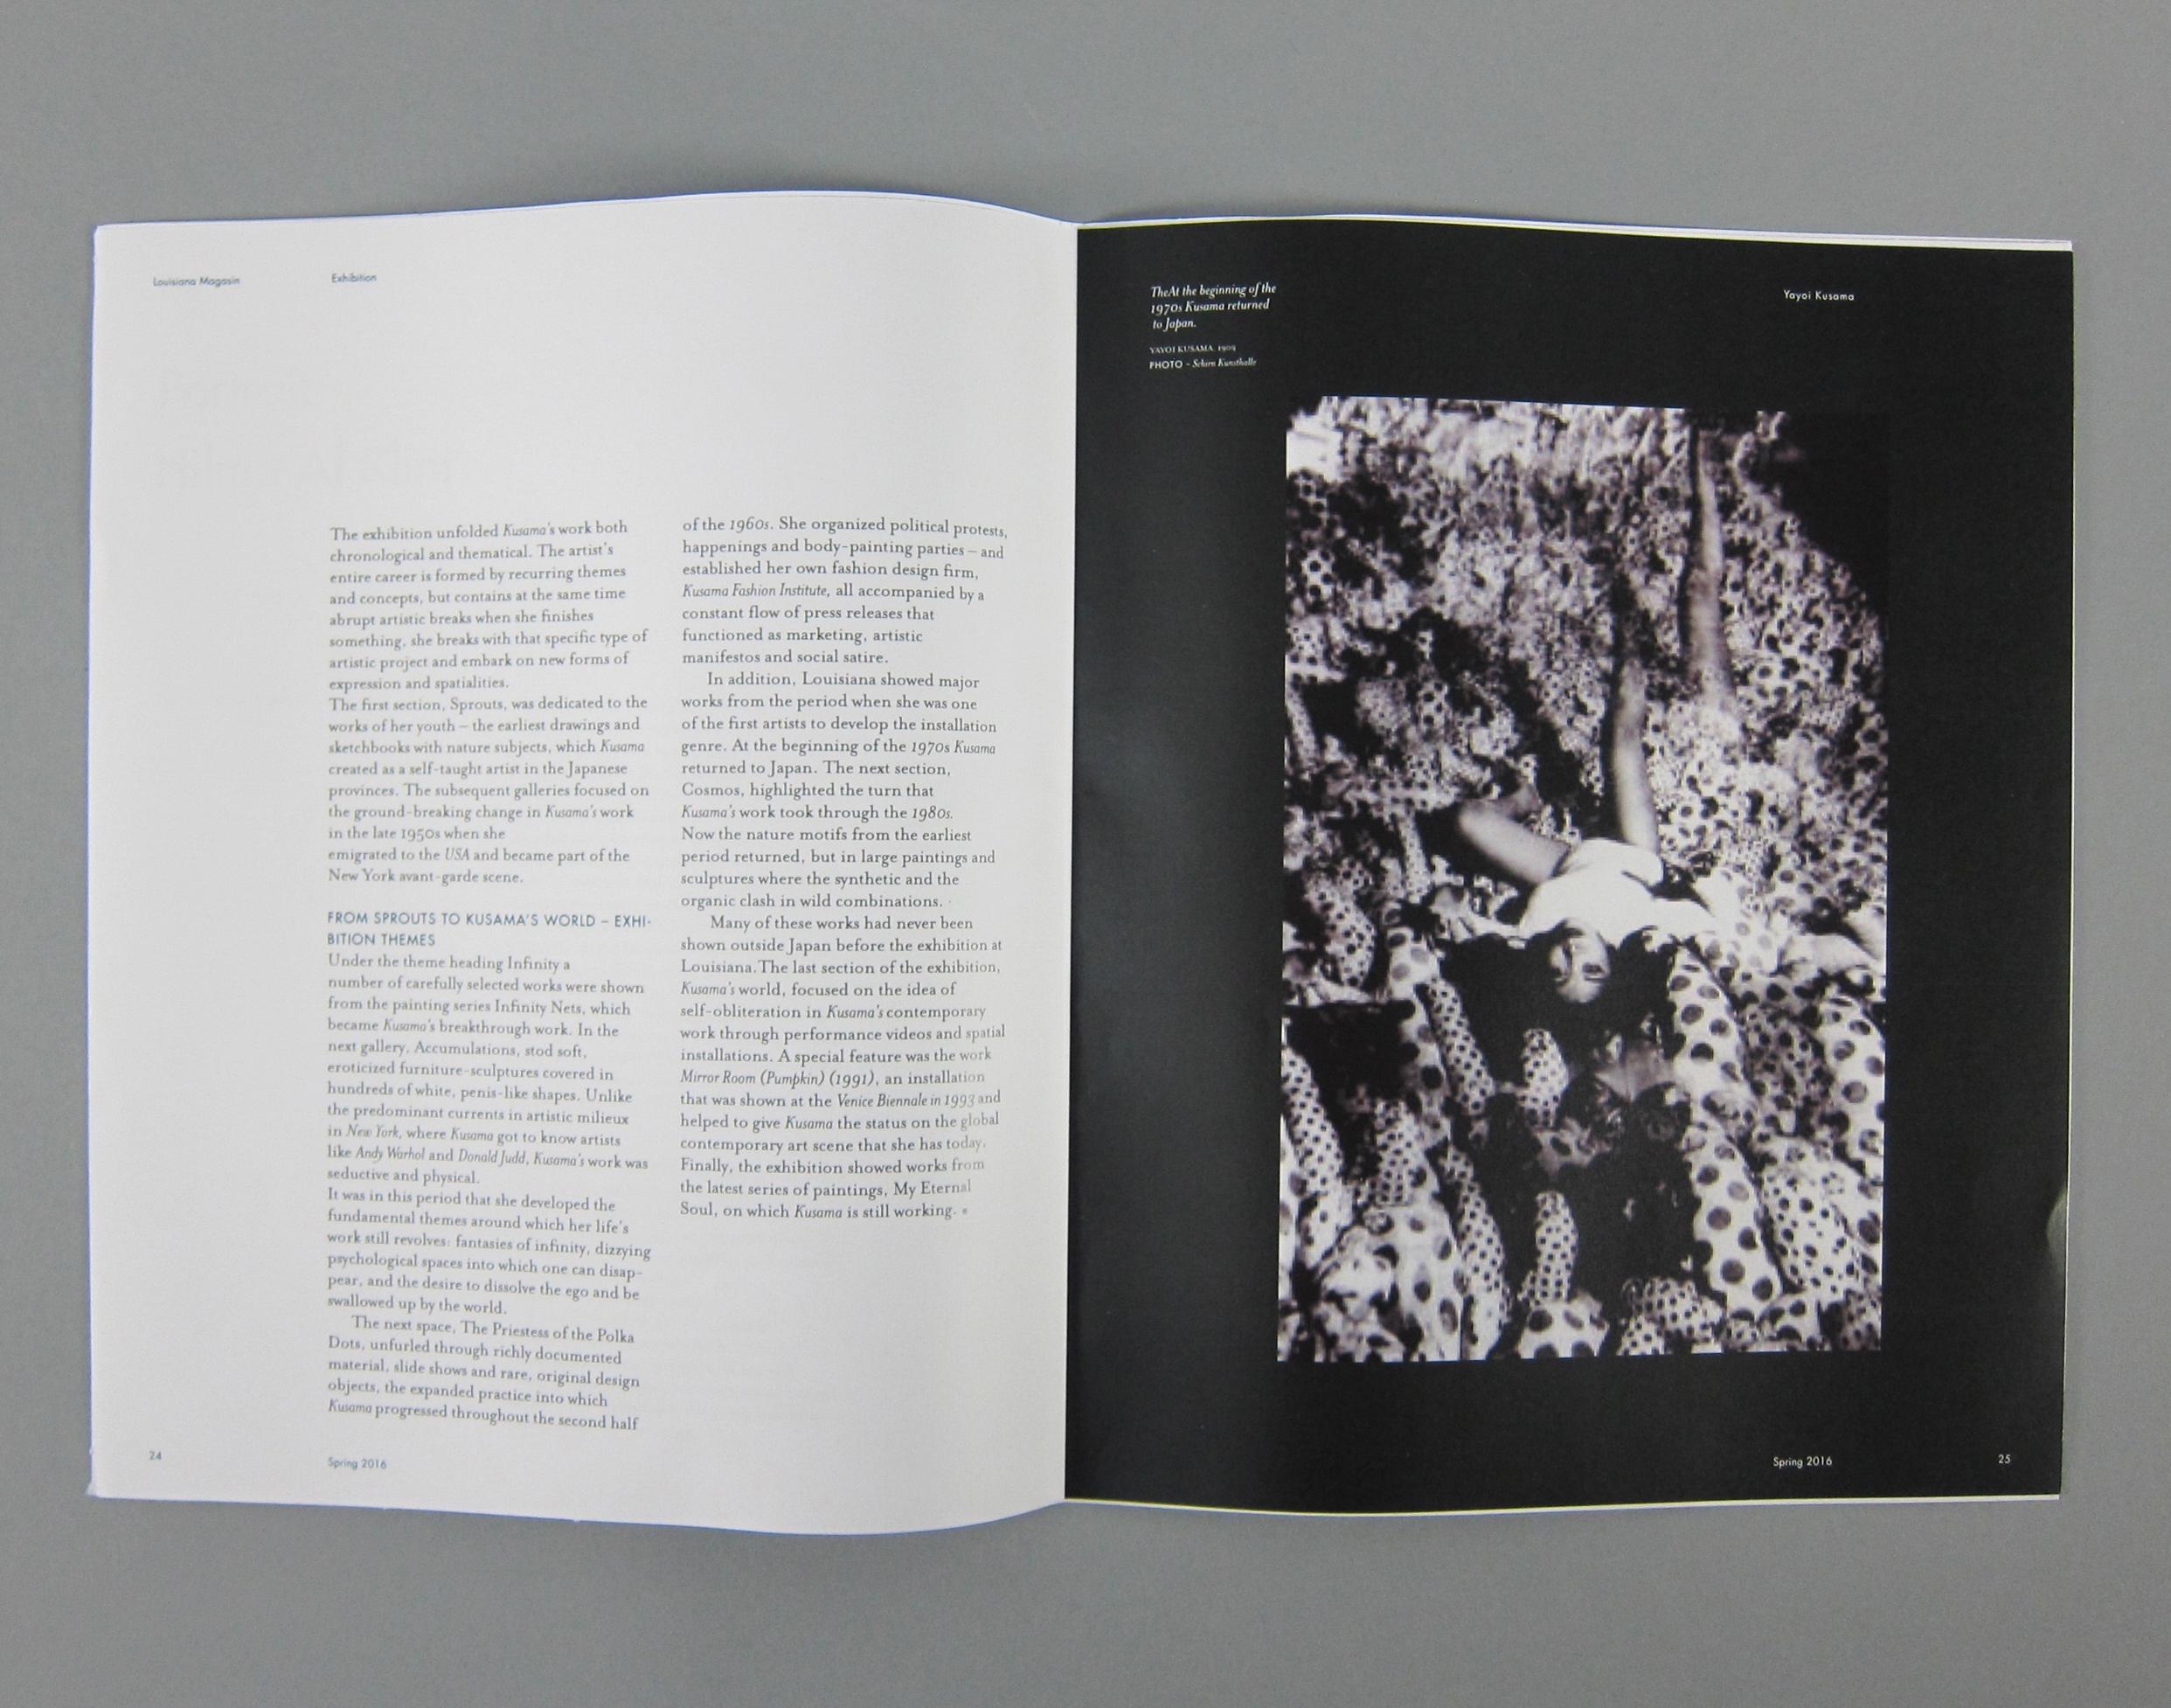 art magazine - redesign on Behance